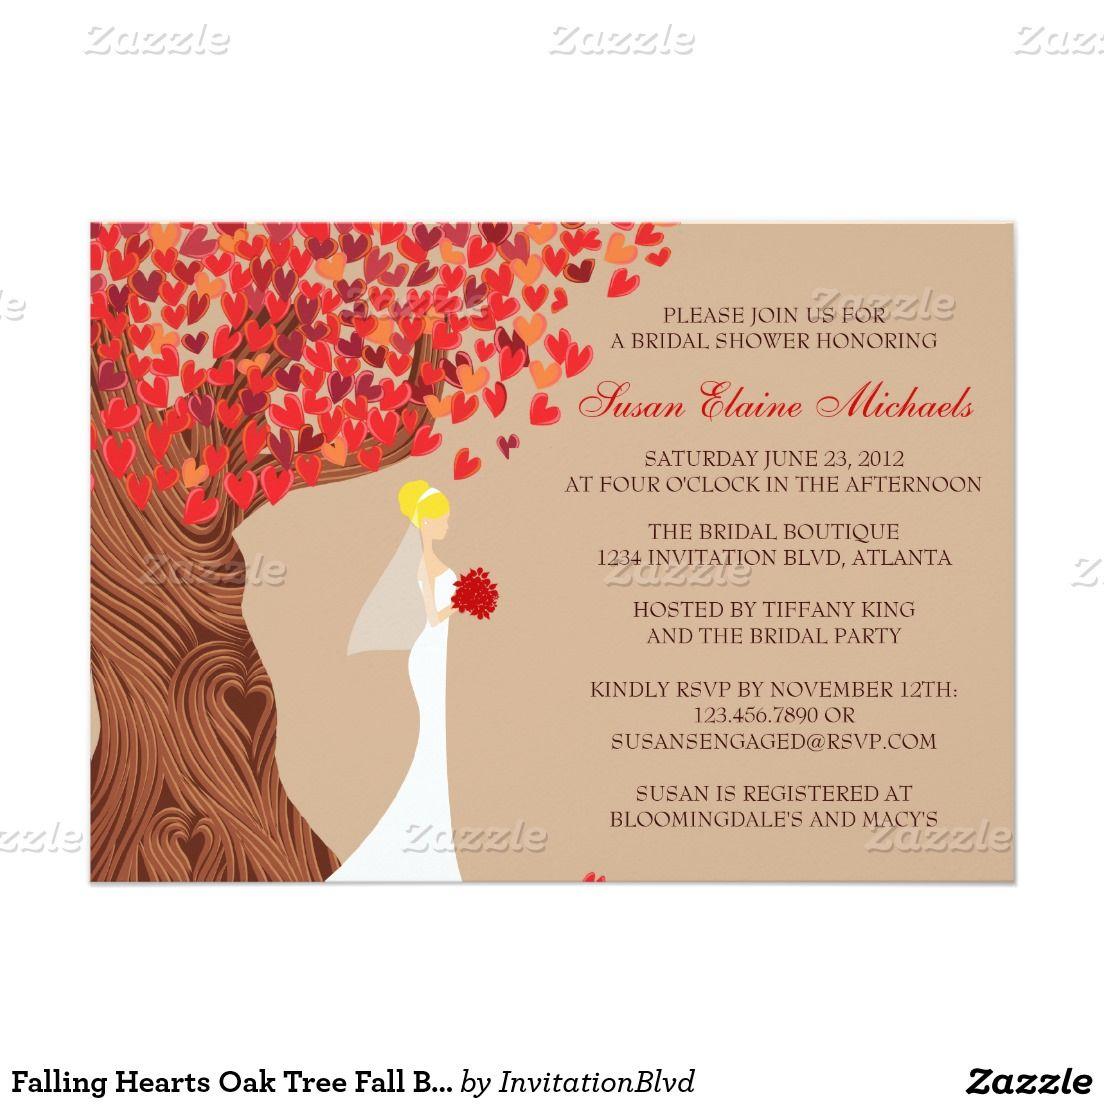 Falling Hearts Oak Tree Fall Bridal Shower Invitation | FALL WEDDING ...